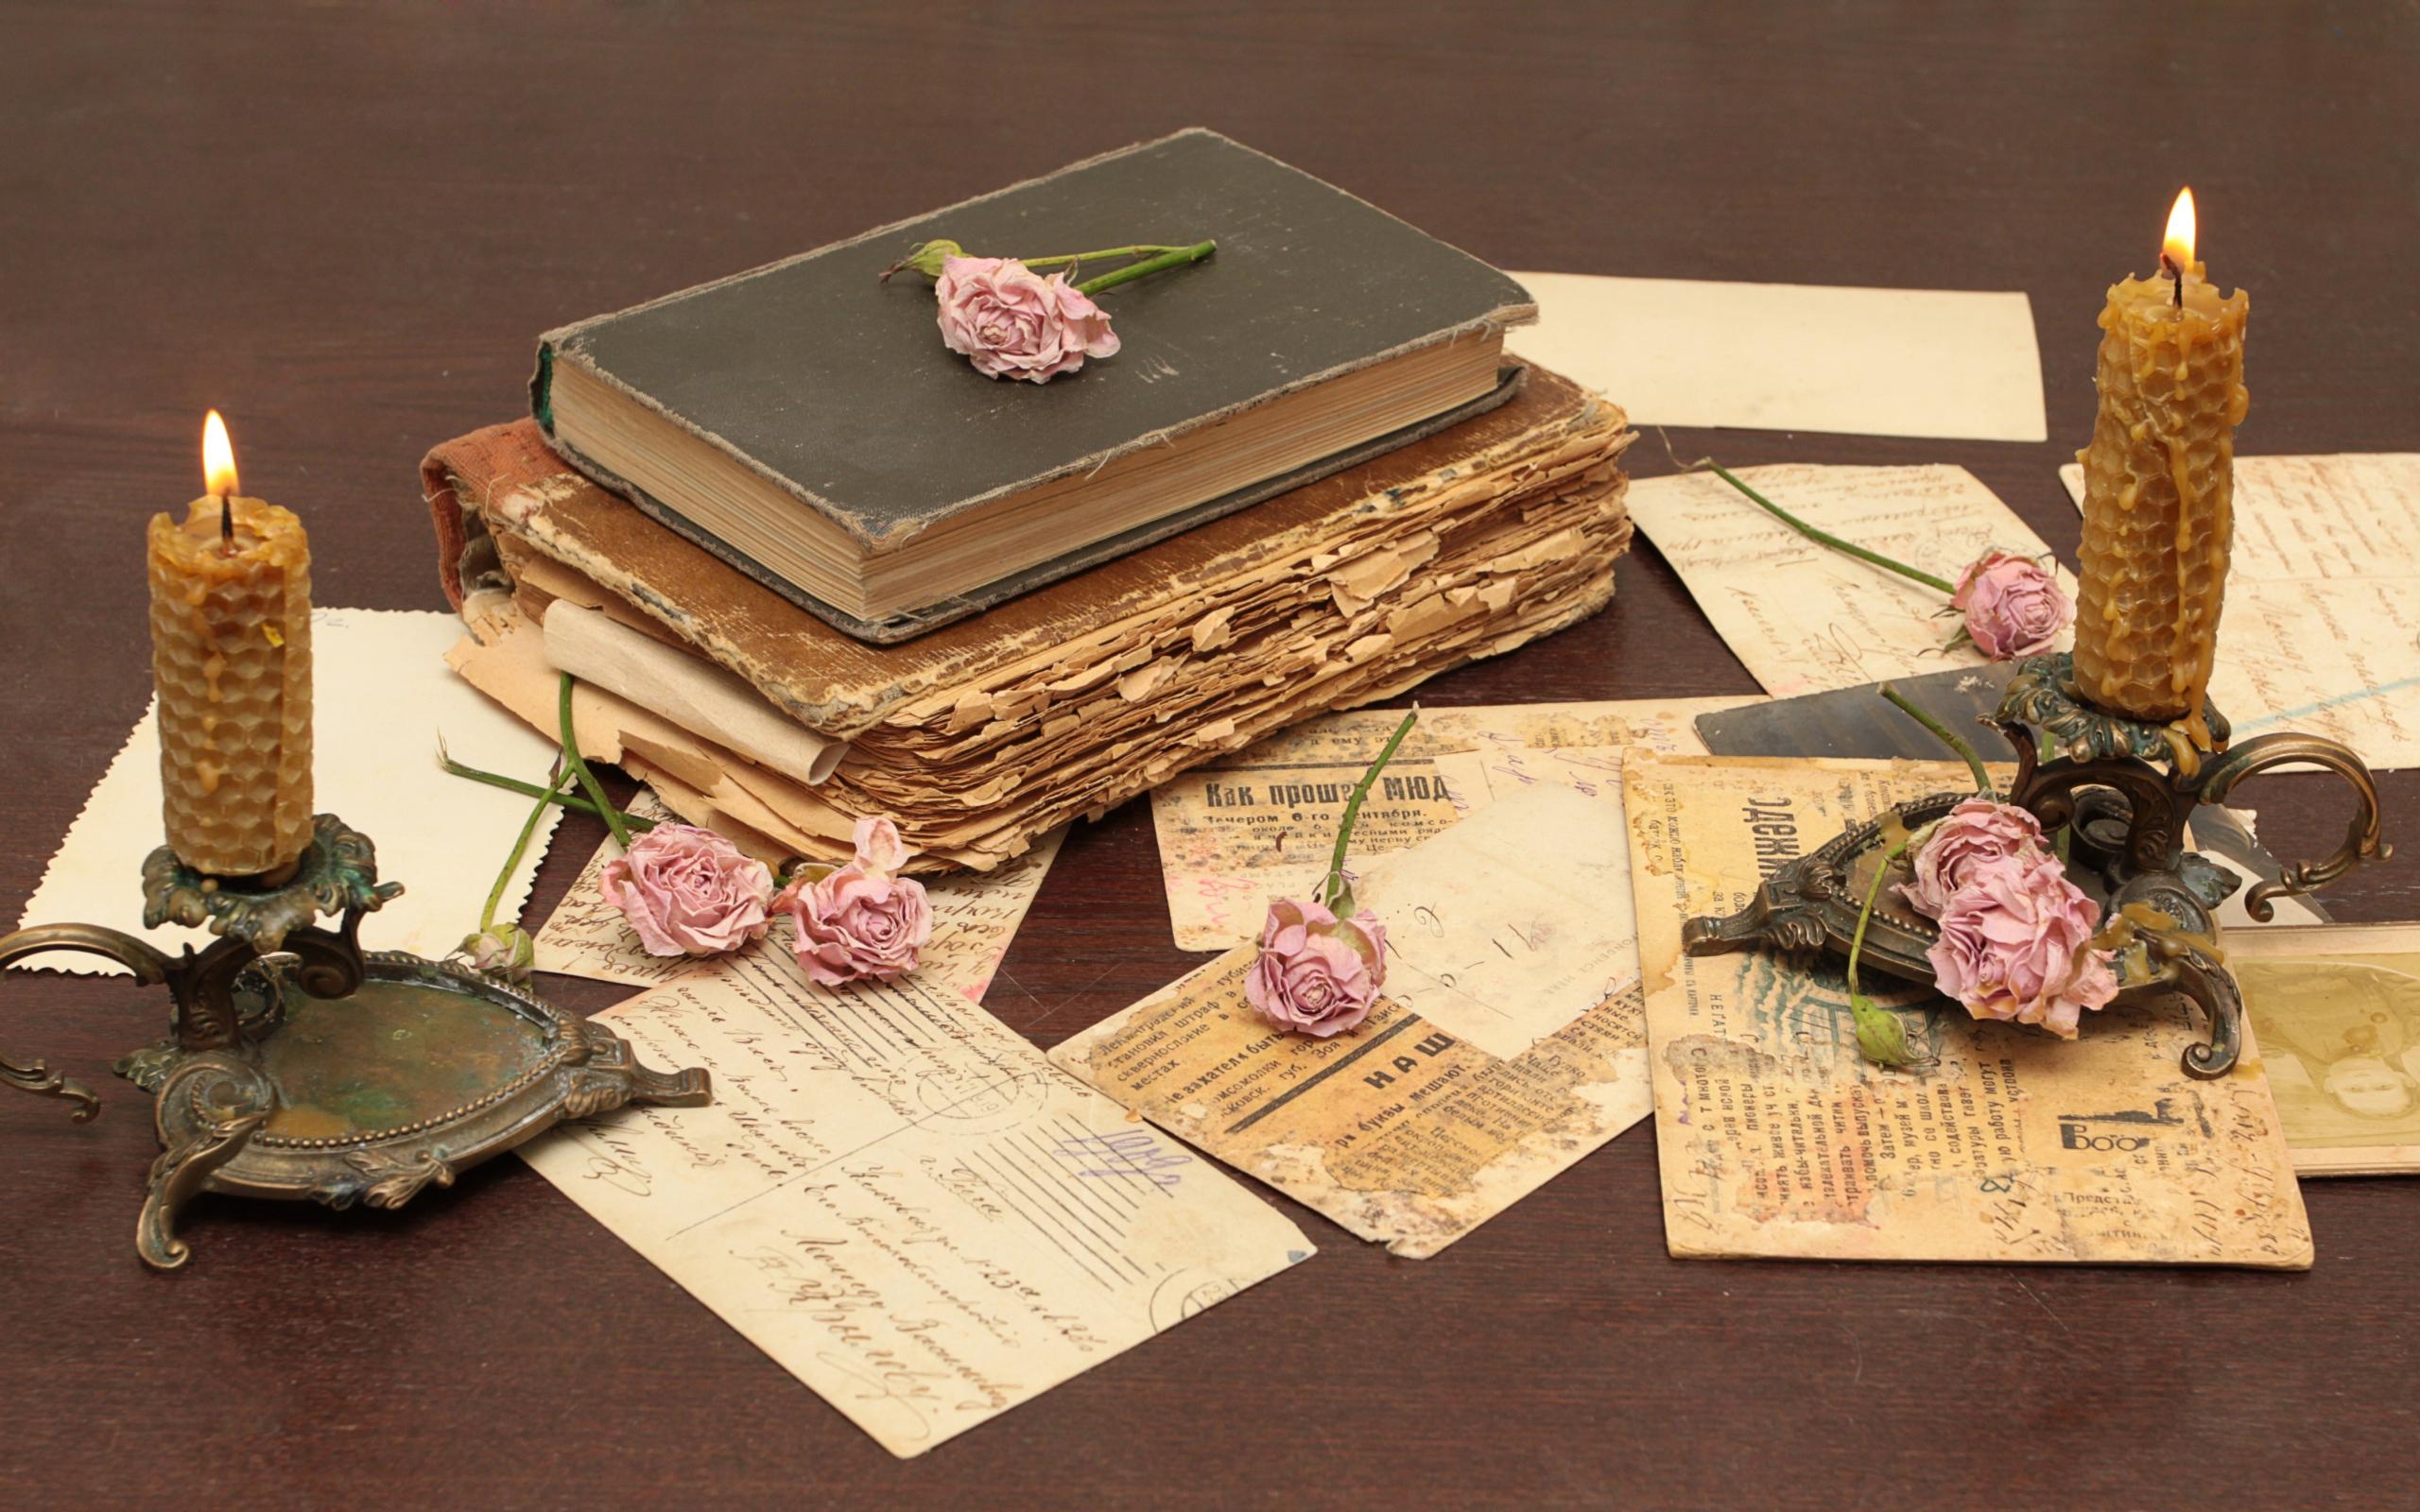 книги, розы, свечки